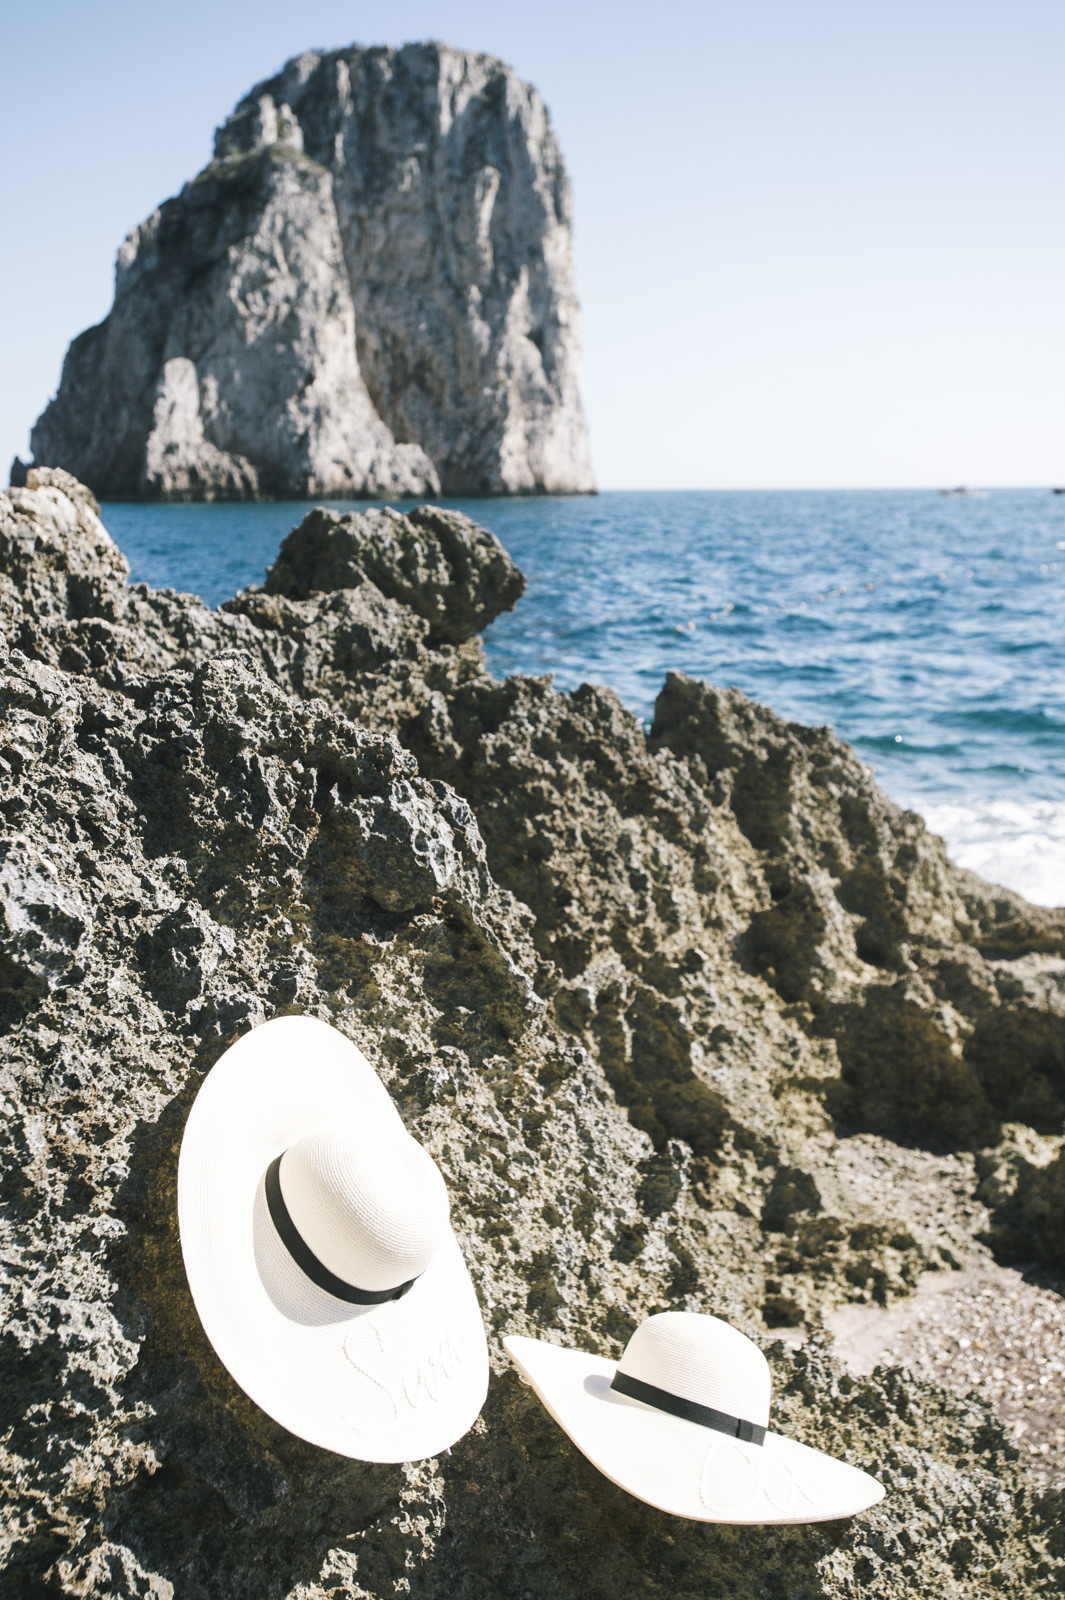 two borsalino on the cliffs